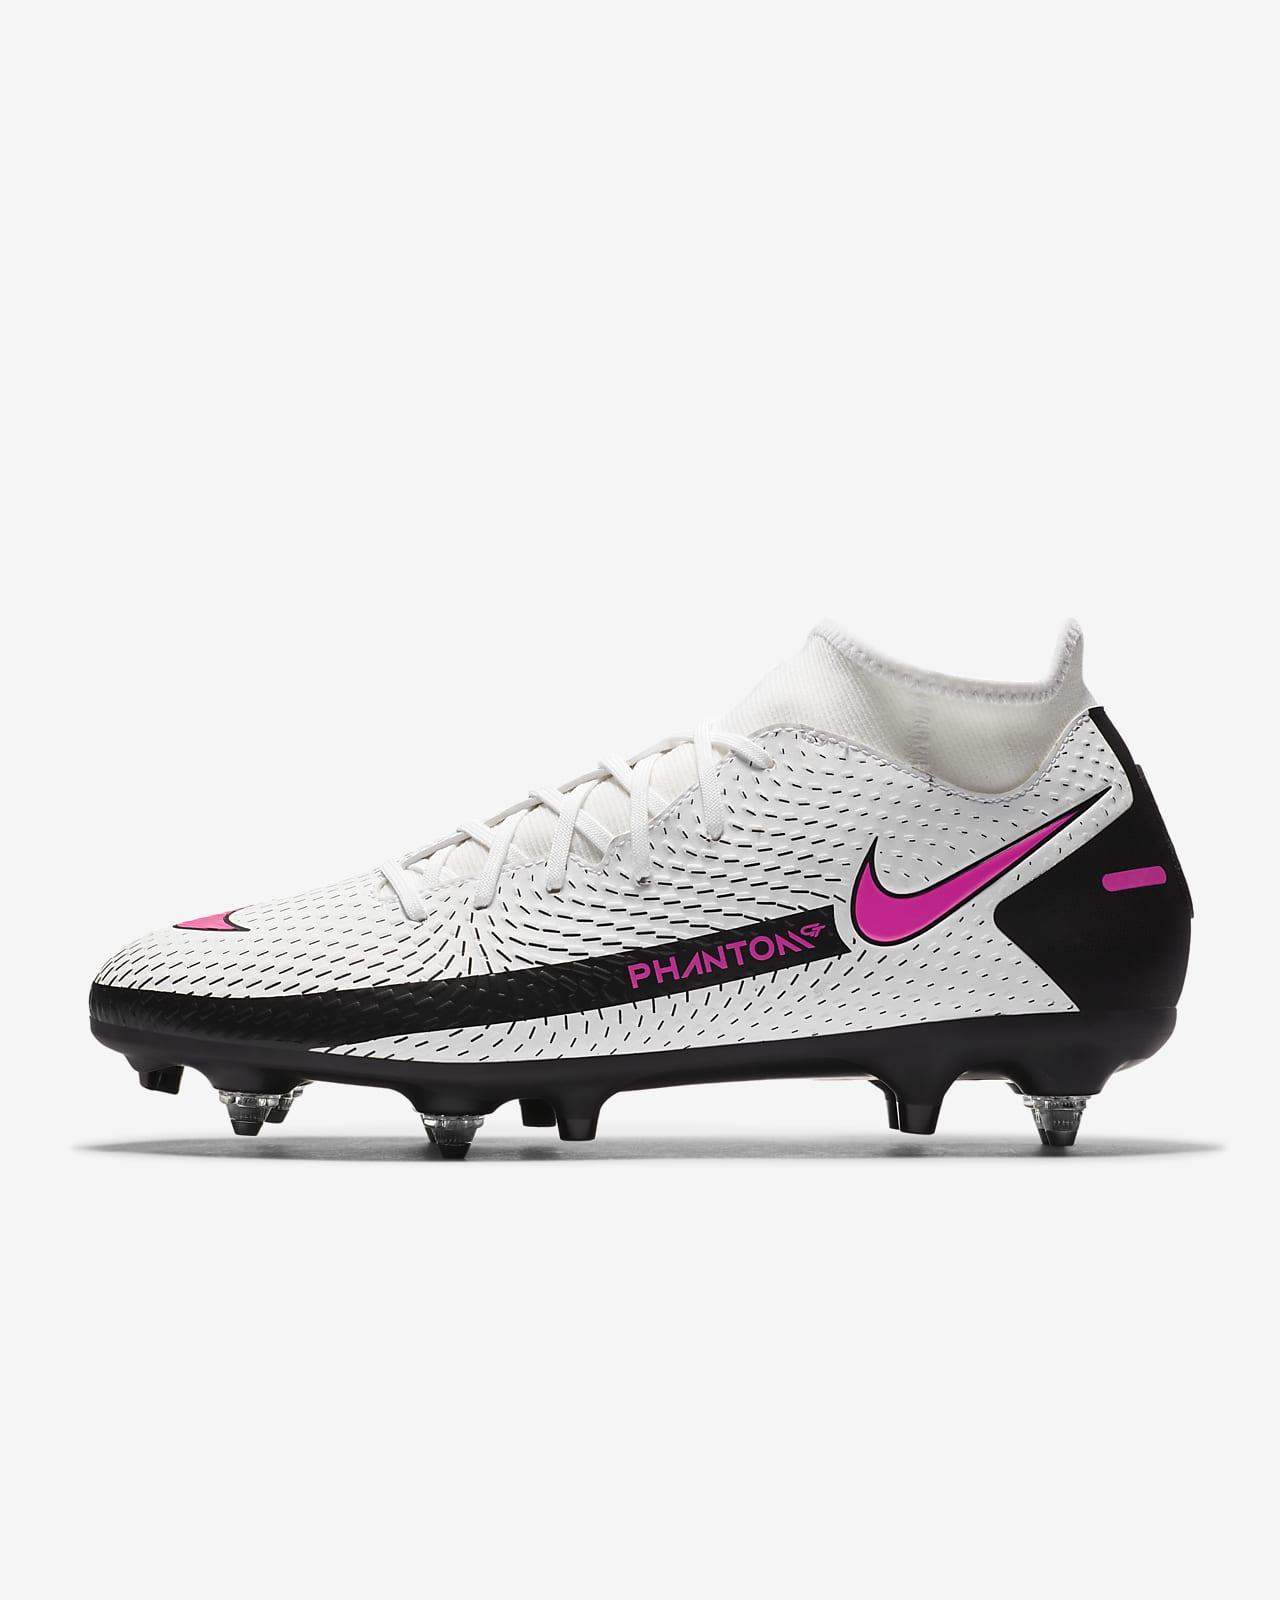 Футбольные бутсы для игры на мягком грунте Nike Phantom GT Academy Dynamic Fit SG-PRO Anti-Clog Traction